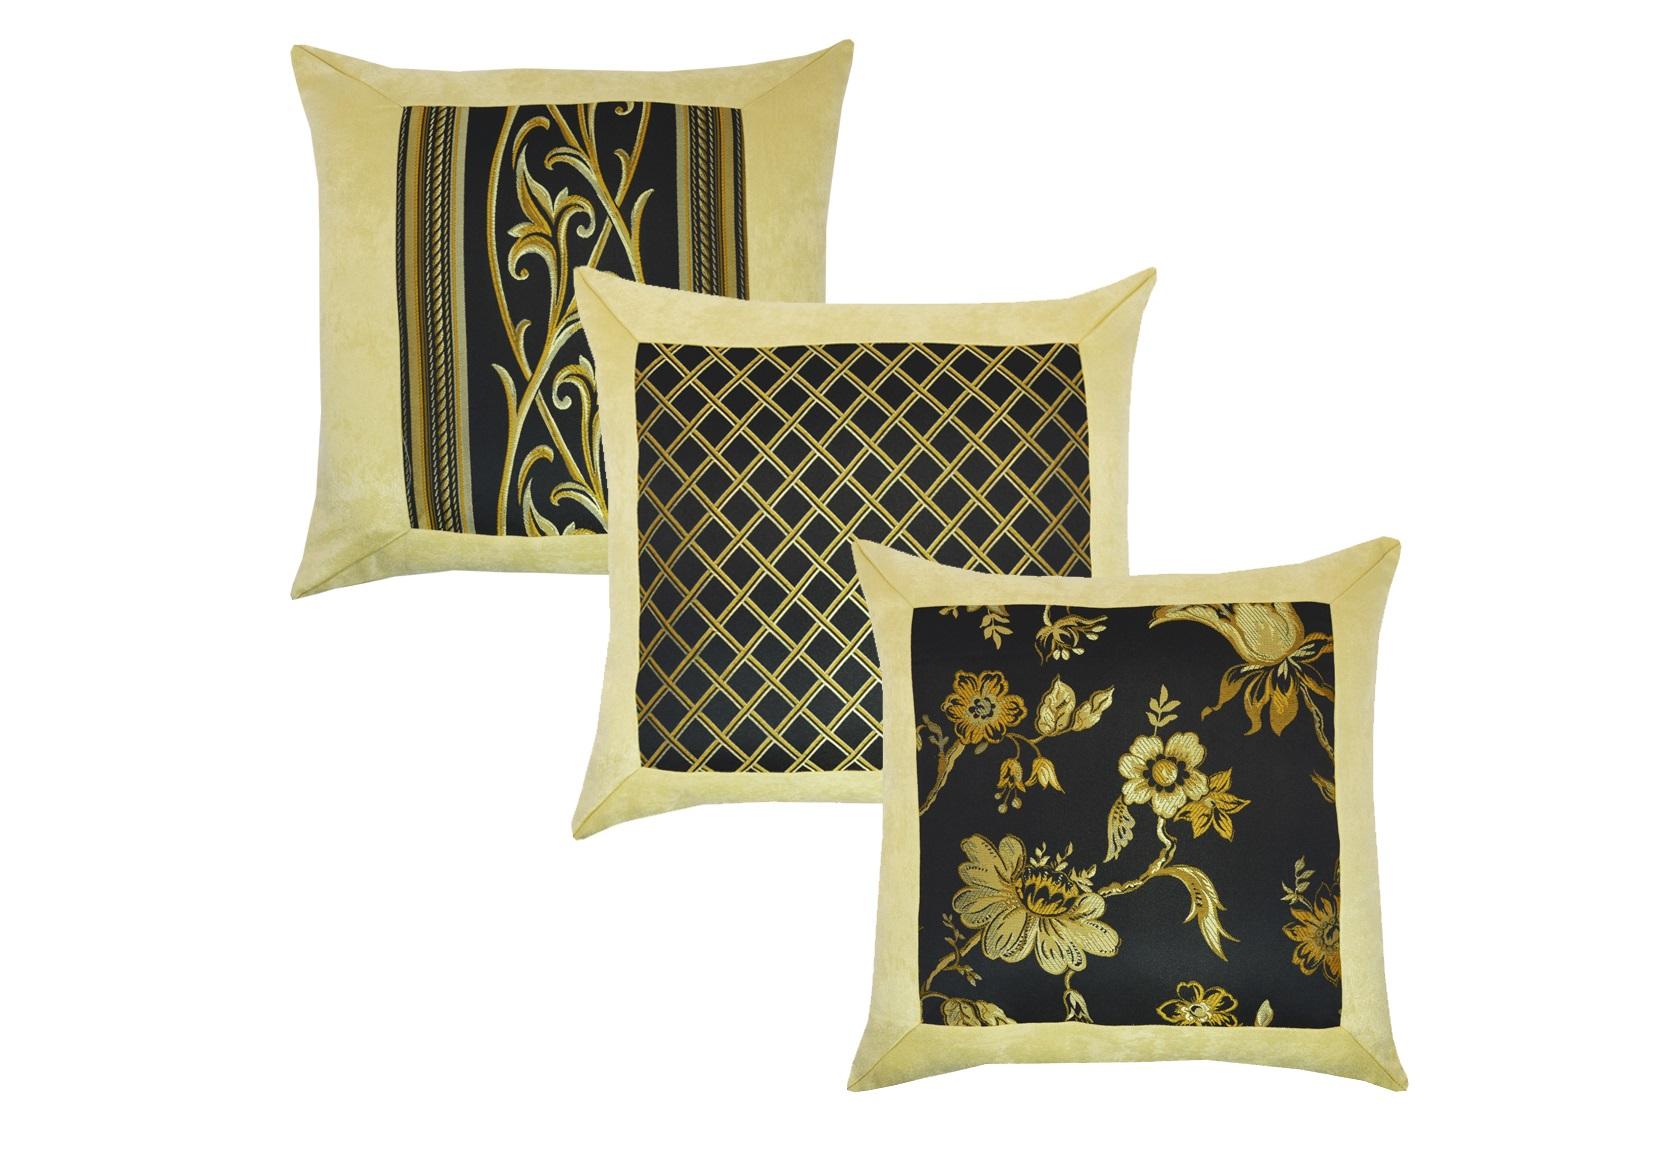 Комплект подушек Ivonne Black (2шт)Квадратные подушки и наволочки<br>Комплект декоративных  подушек. Чехол съемный.<br><br>Material: Вискоза<br>Ширина см: 45<br>Глубина см: 15